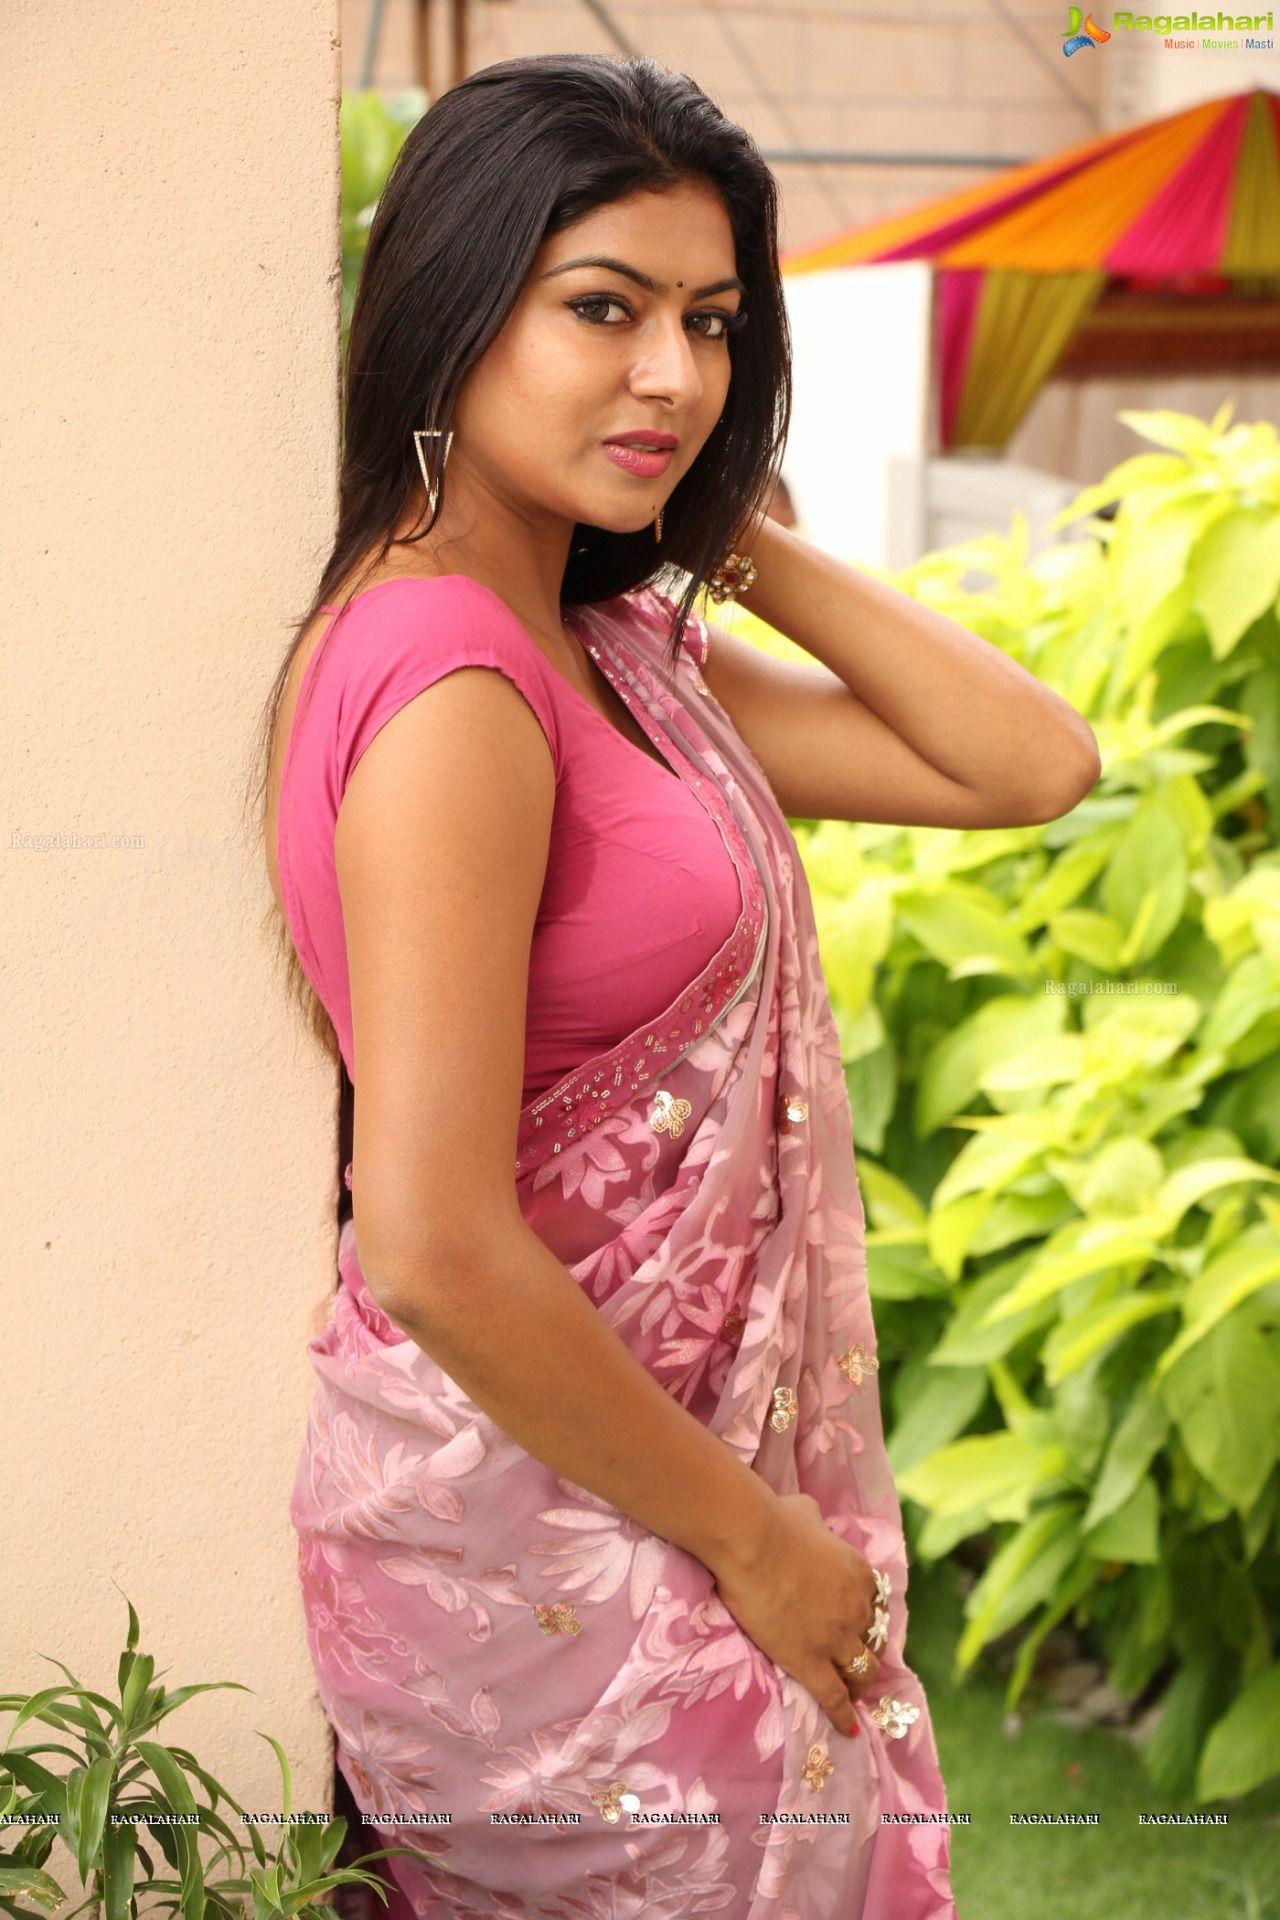 Pin By Gowri Kenesten On Sarees  Indian Actresses, Indian -9633